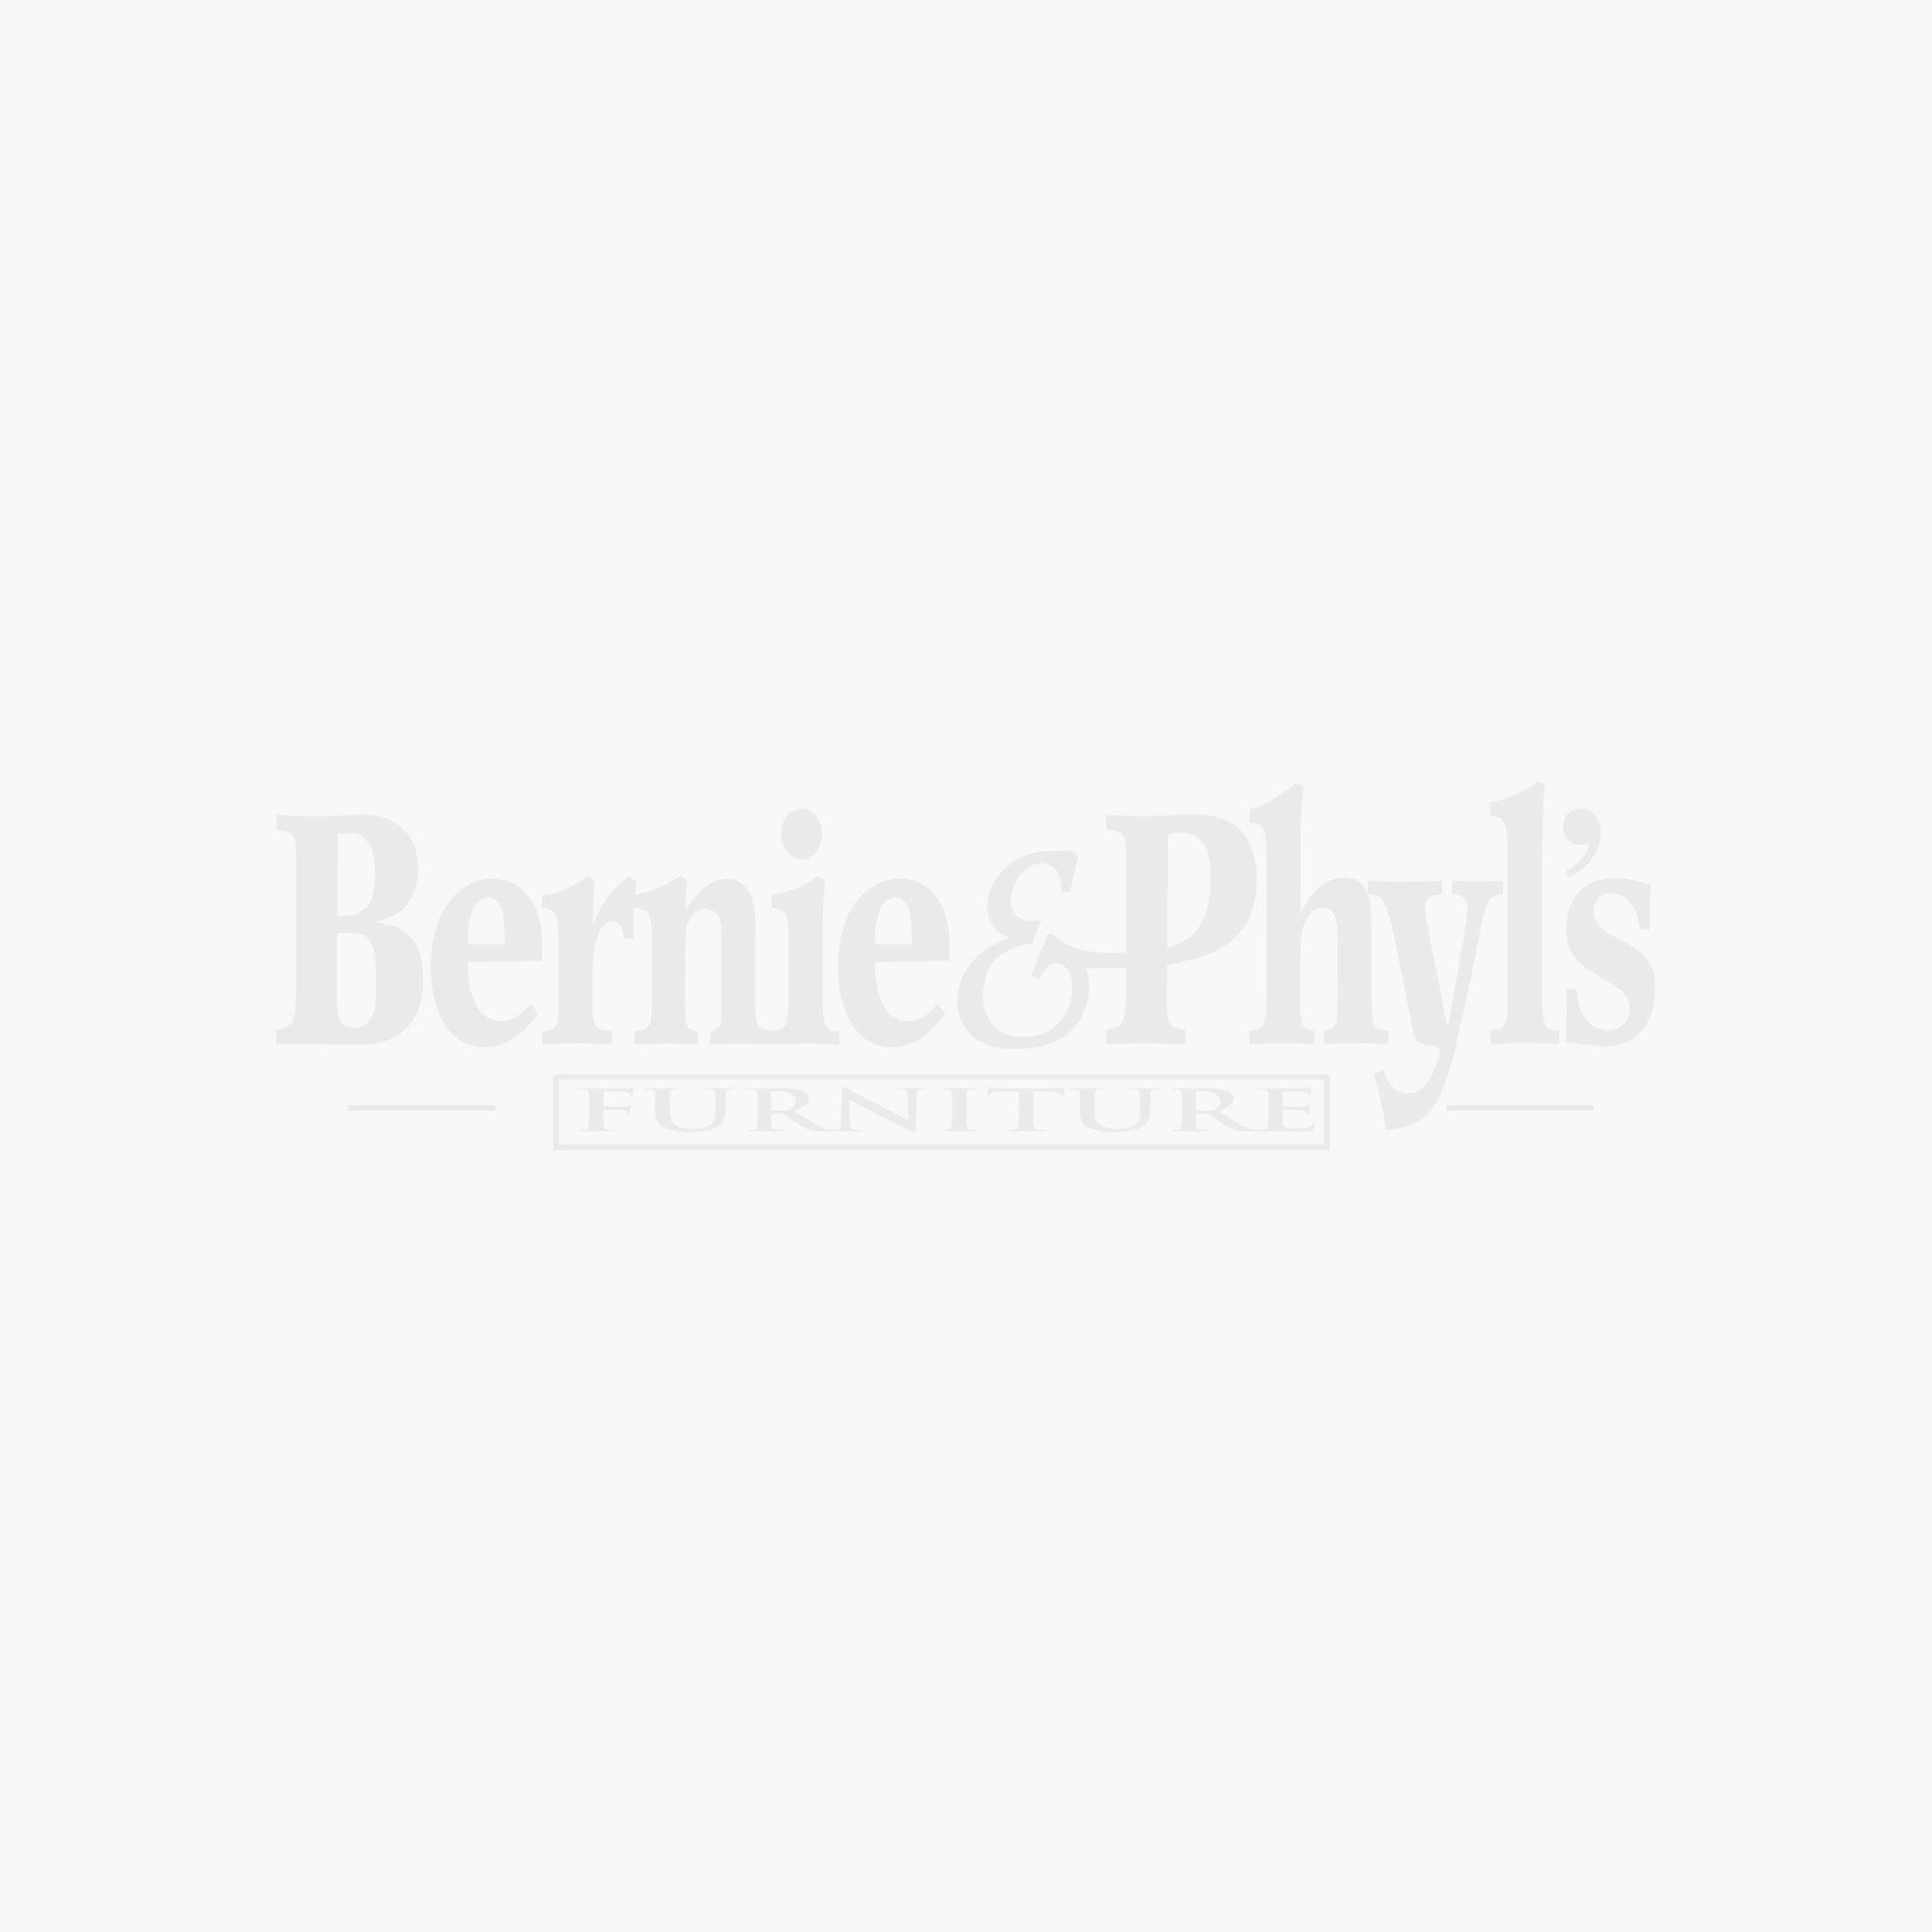 Sealy Beauvior Firm Mattress